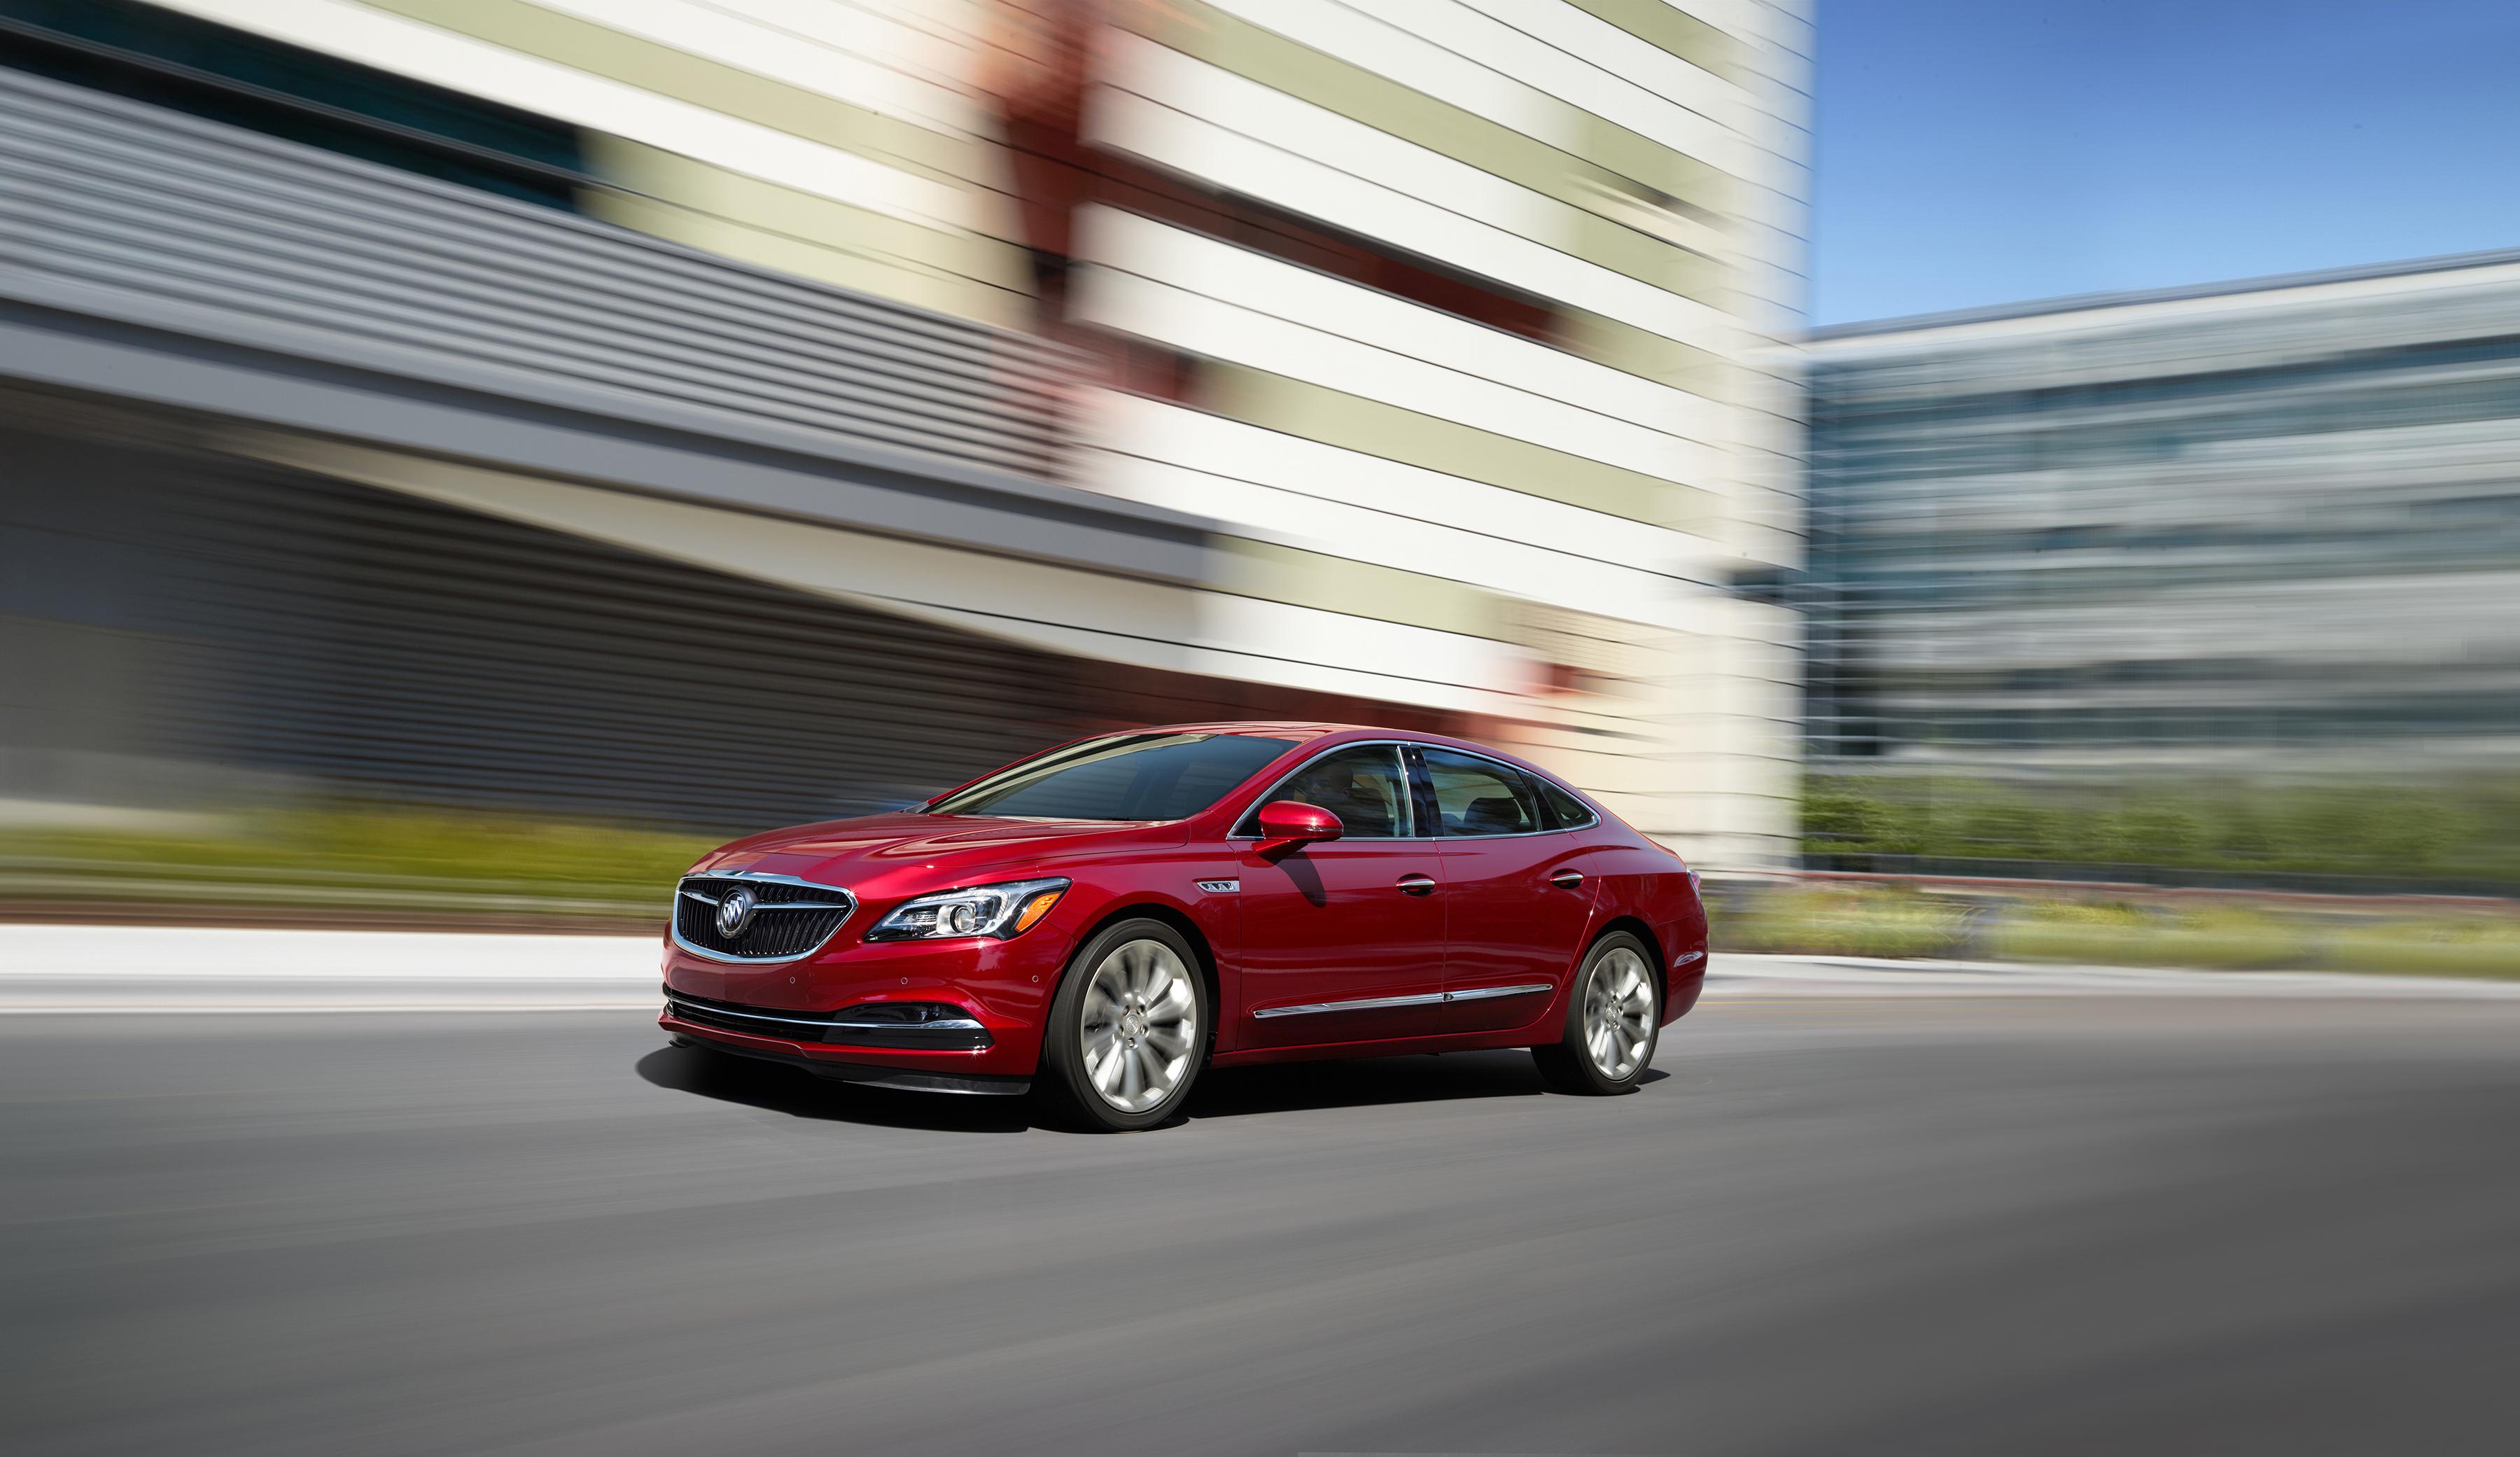 Light Electrification Leads 2018 Buick LaCrosse Updates